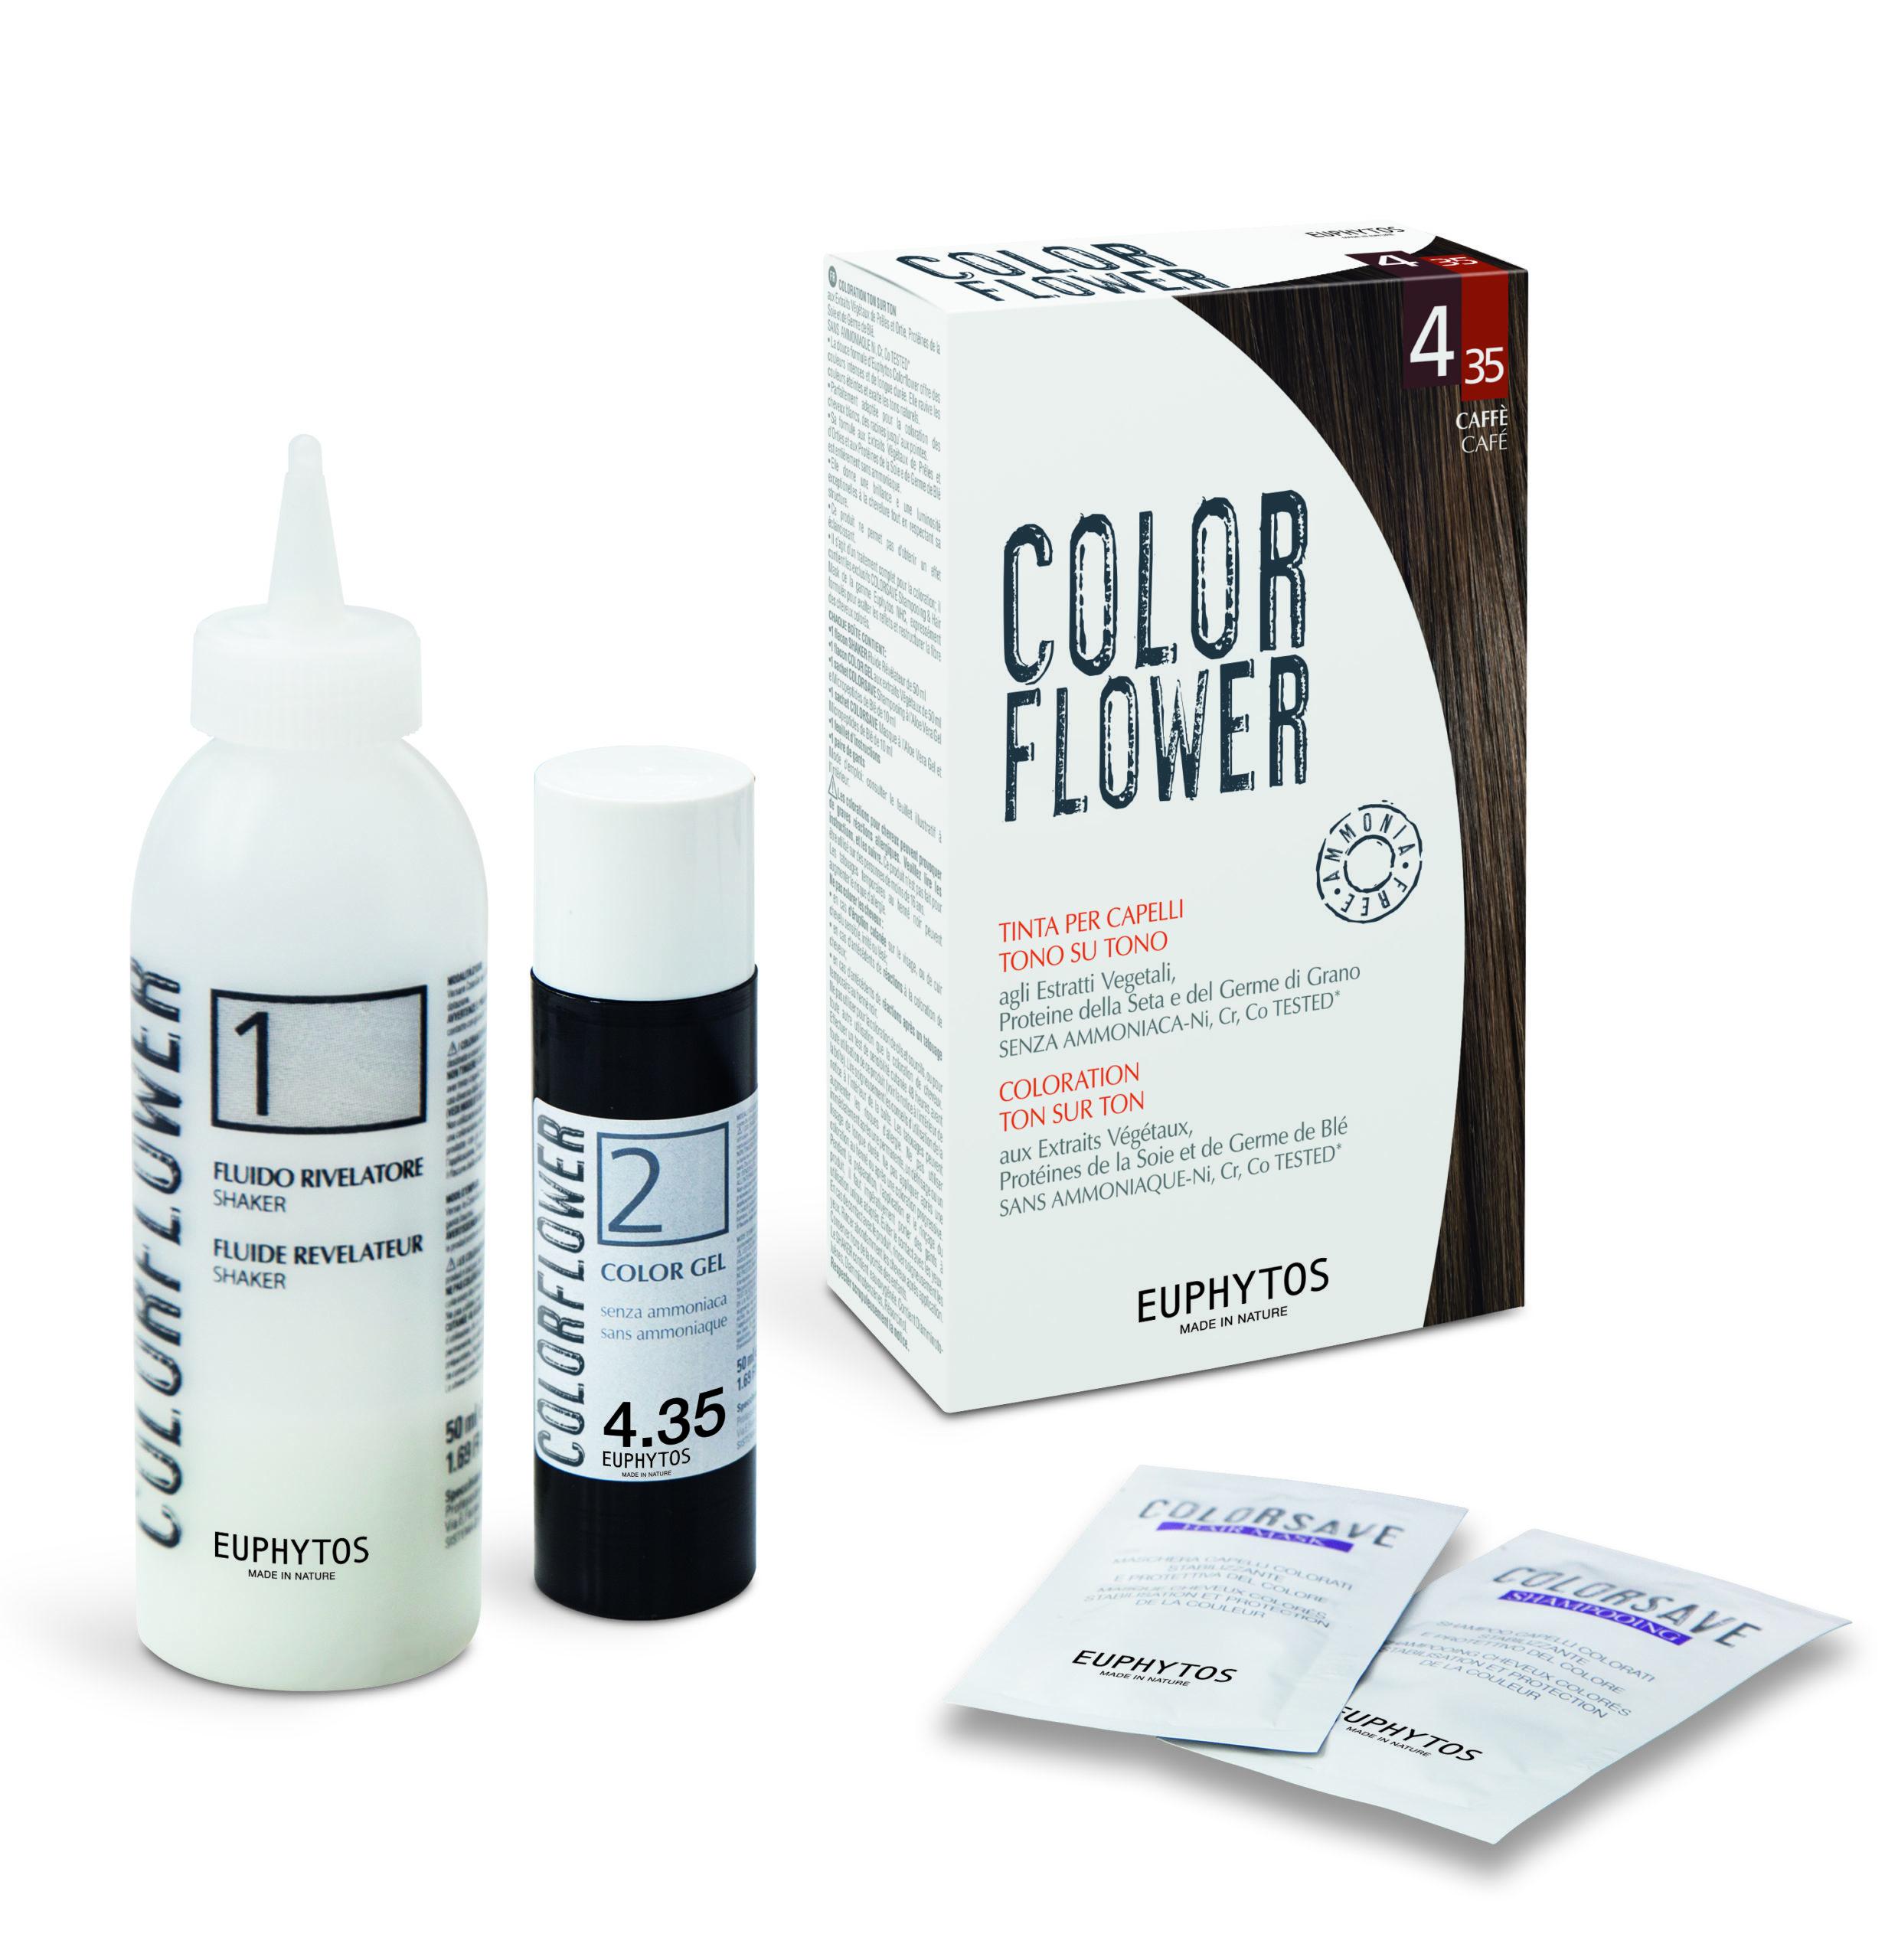 Pack-Color-Flower-4_35-scaled.jpg